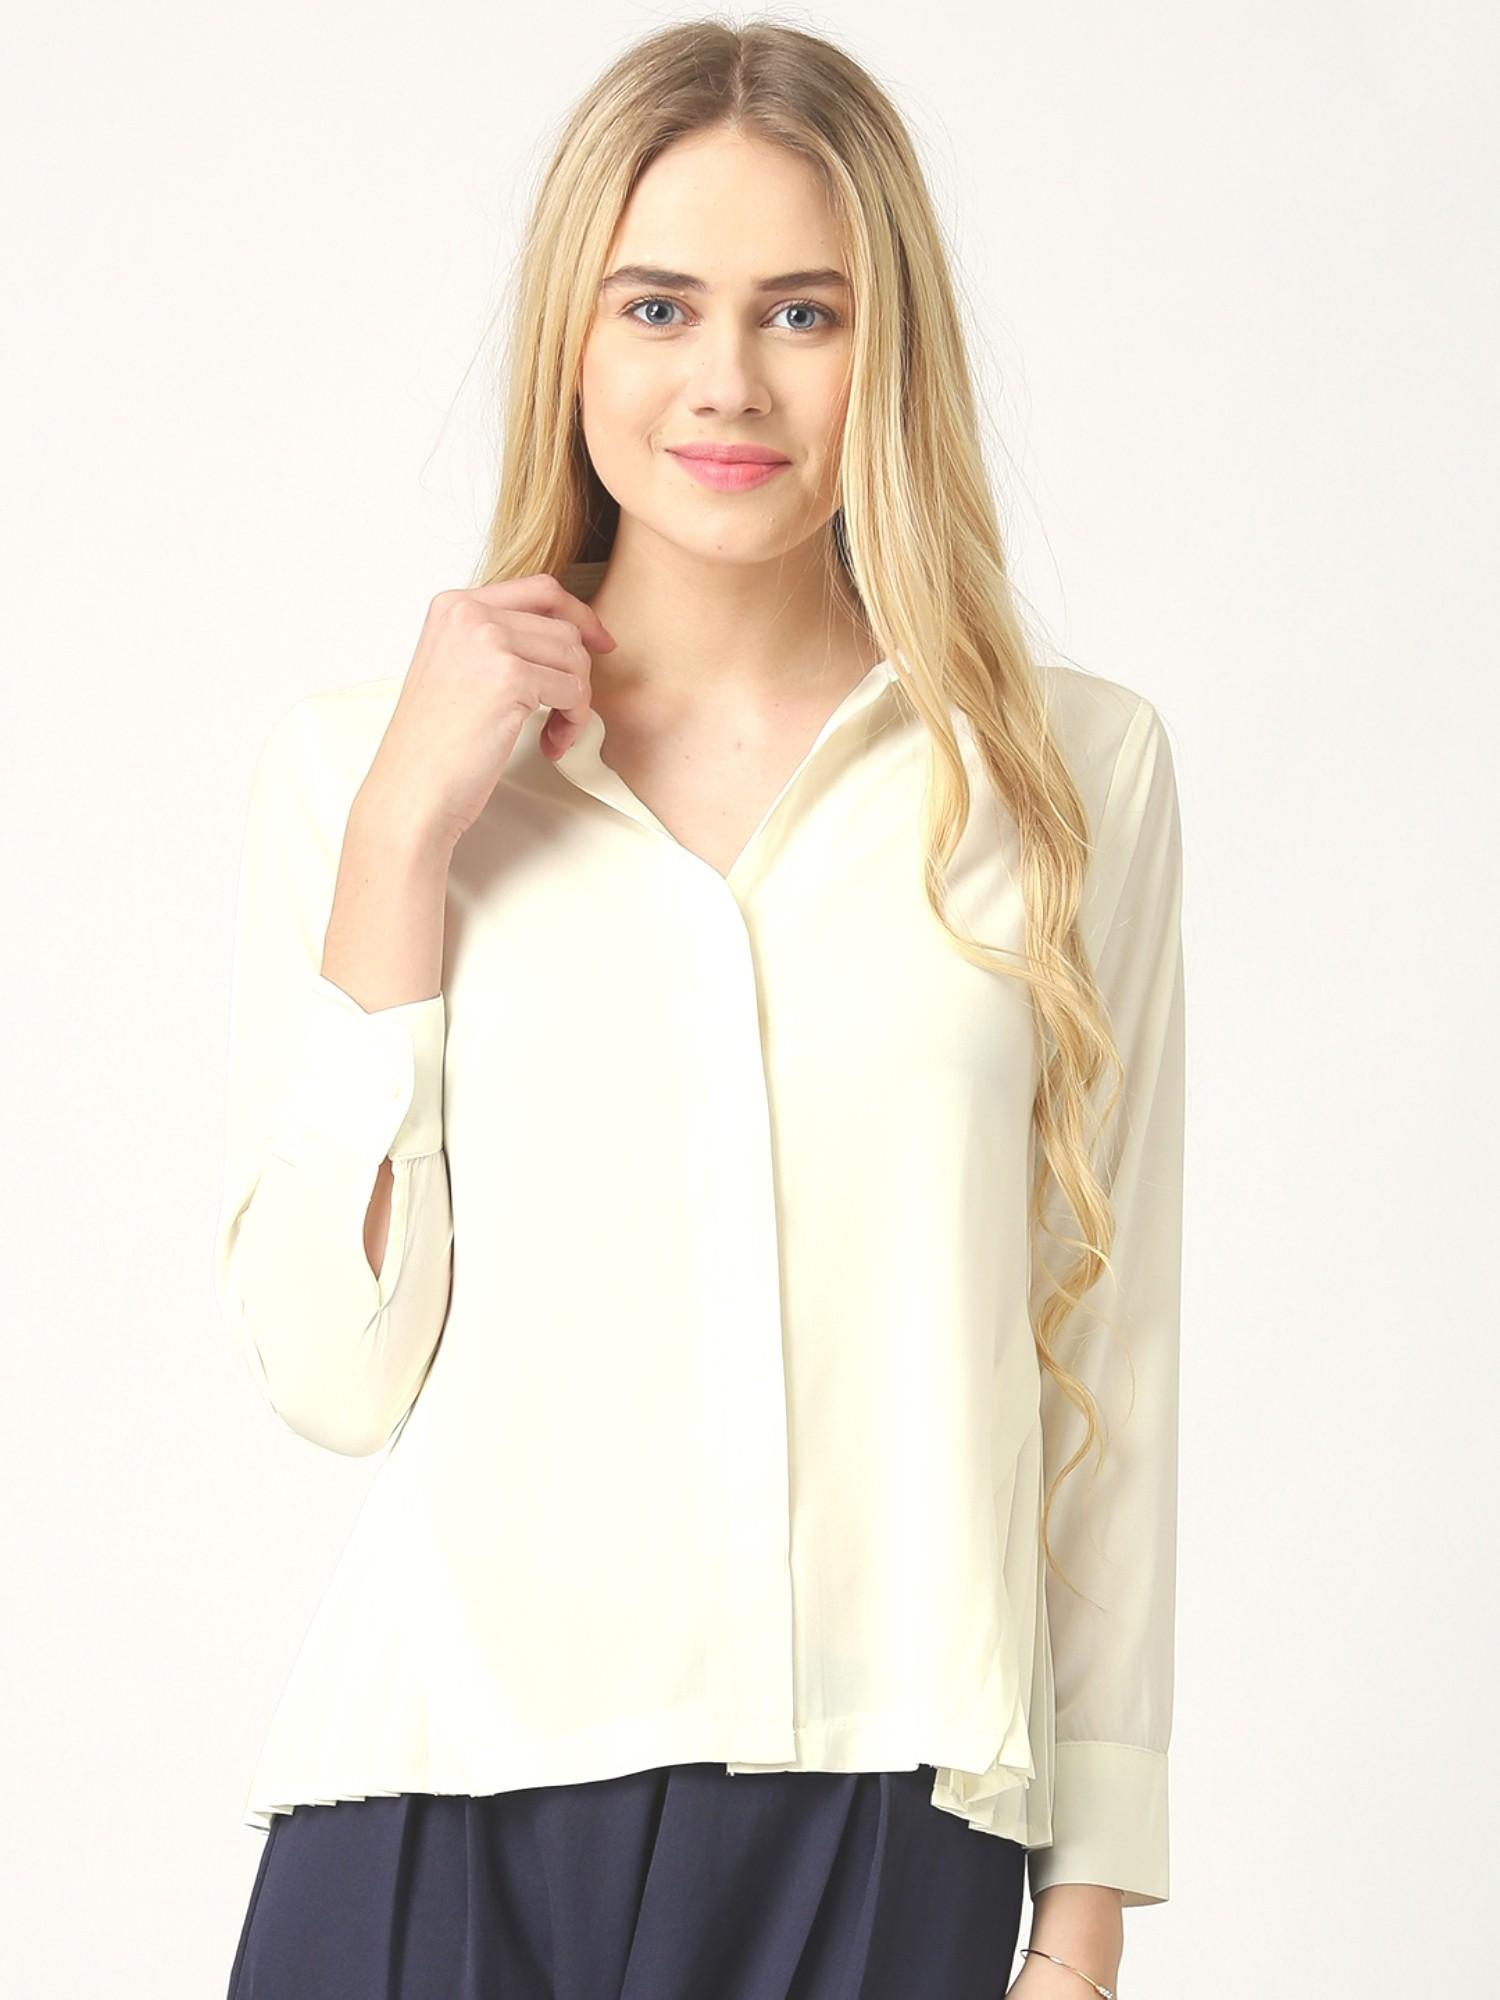 Deals - Mumbai - Marie Claire <br> Fresh Selection<br> Category - clothing<br> Business - Flipkart.com